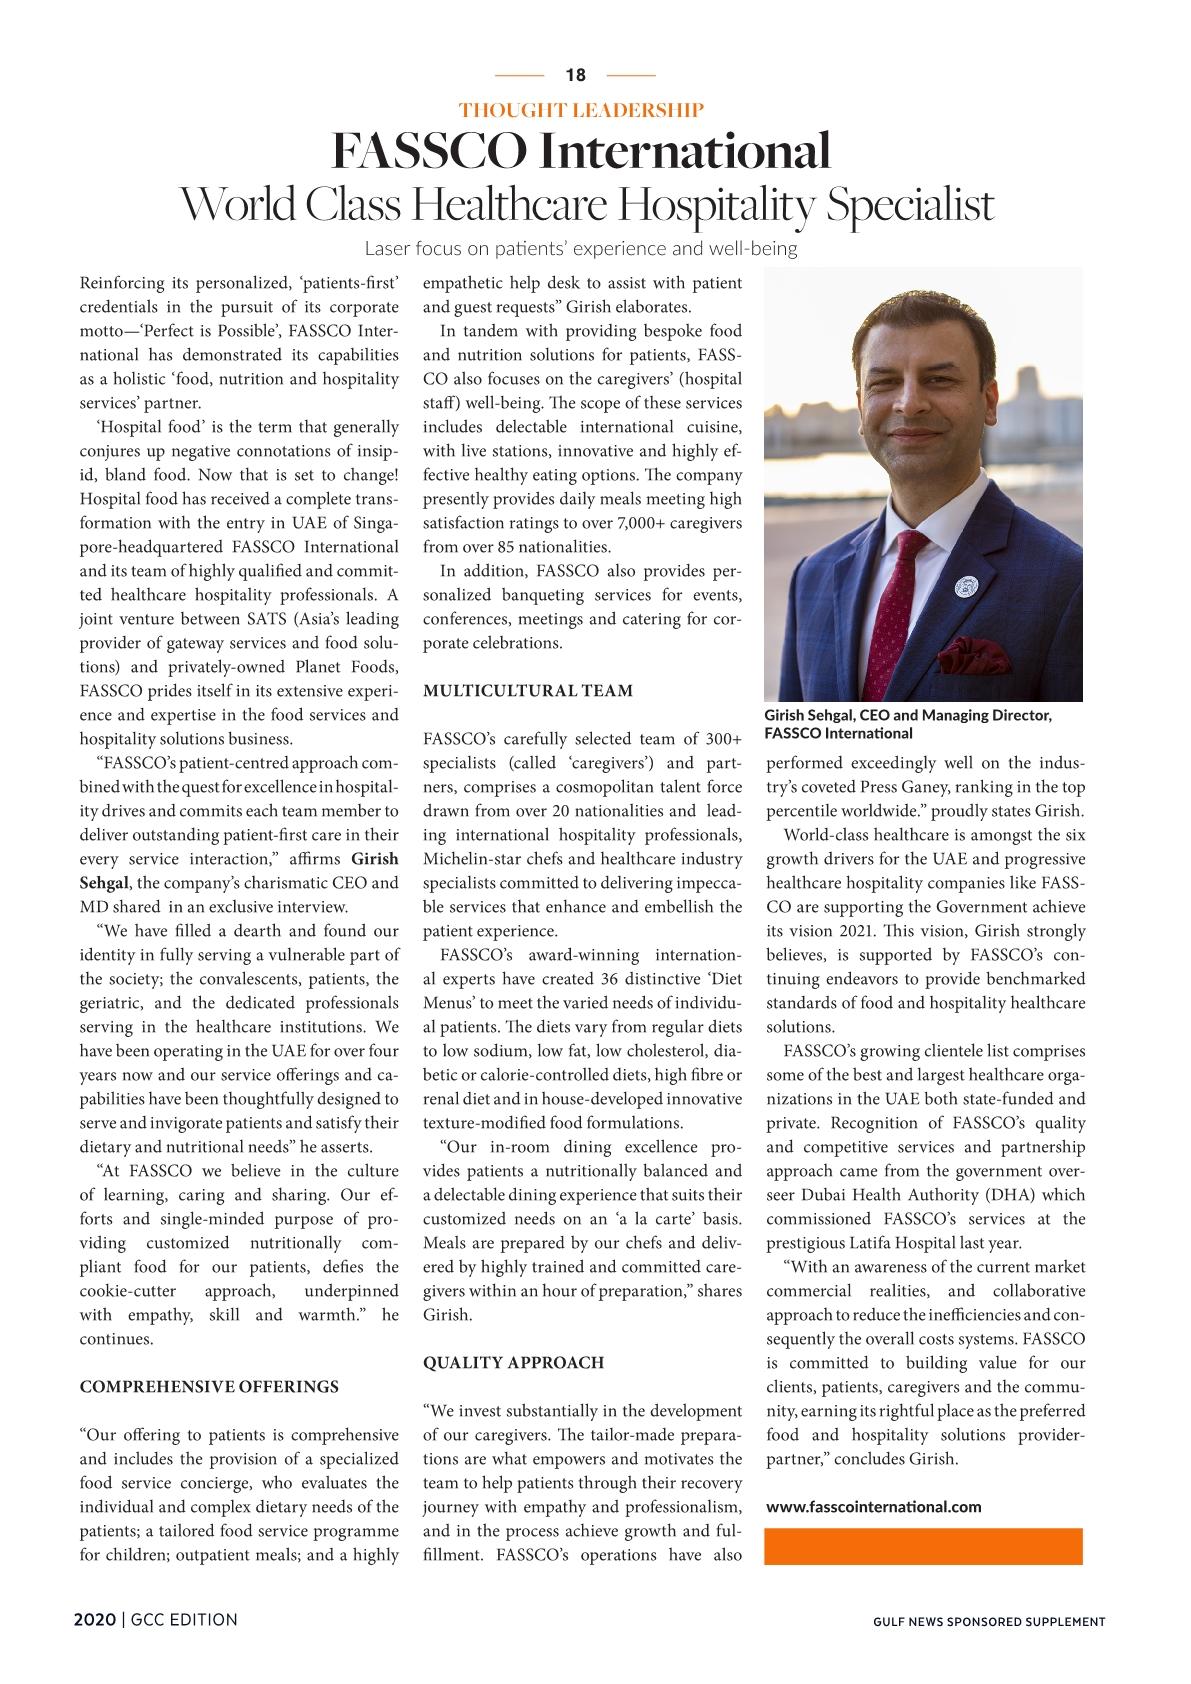 Gulf News - FASSCO